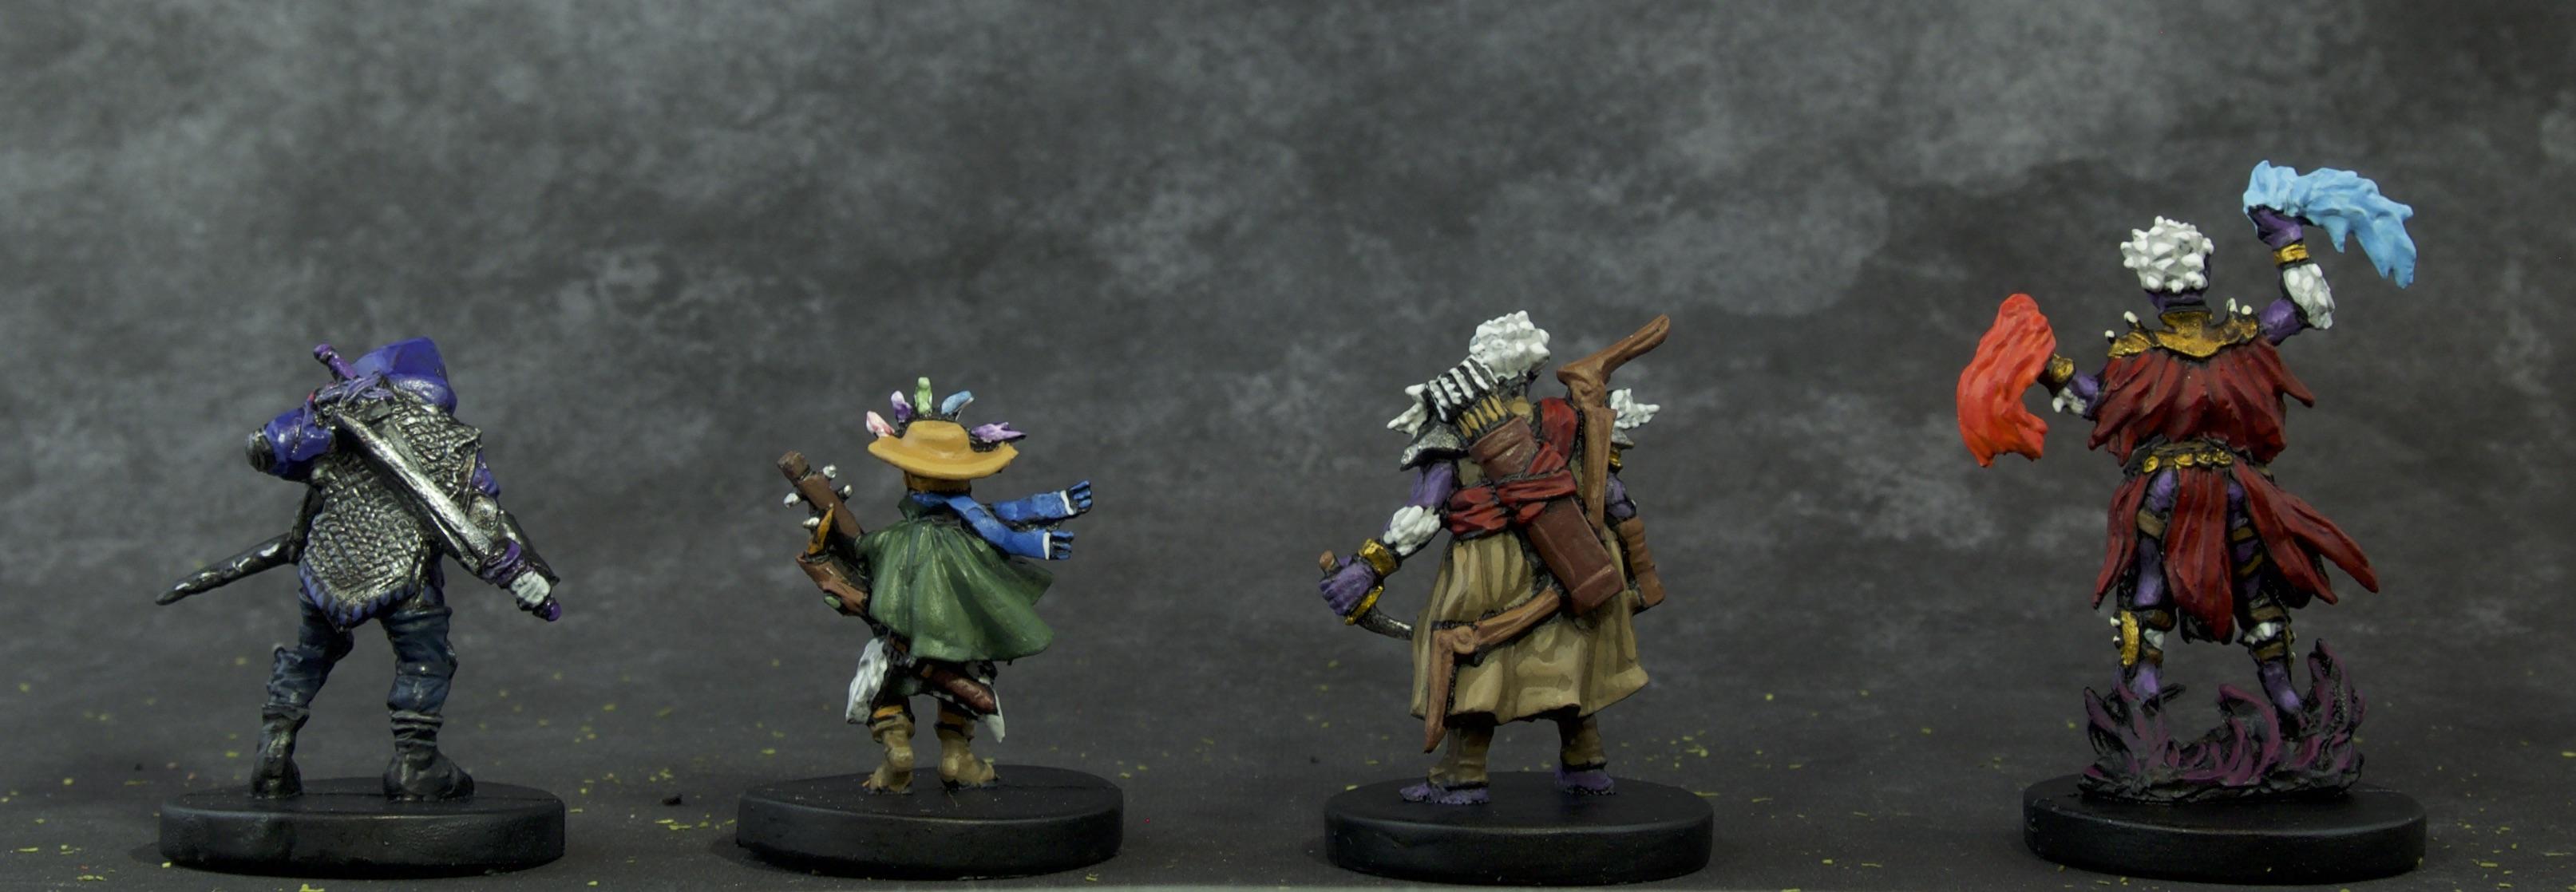 Painted Gloomhaven Miniatures